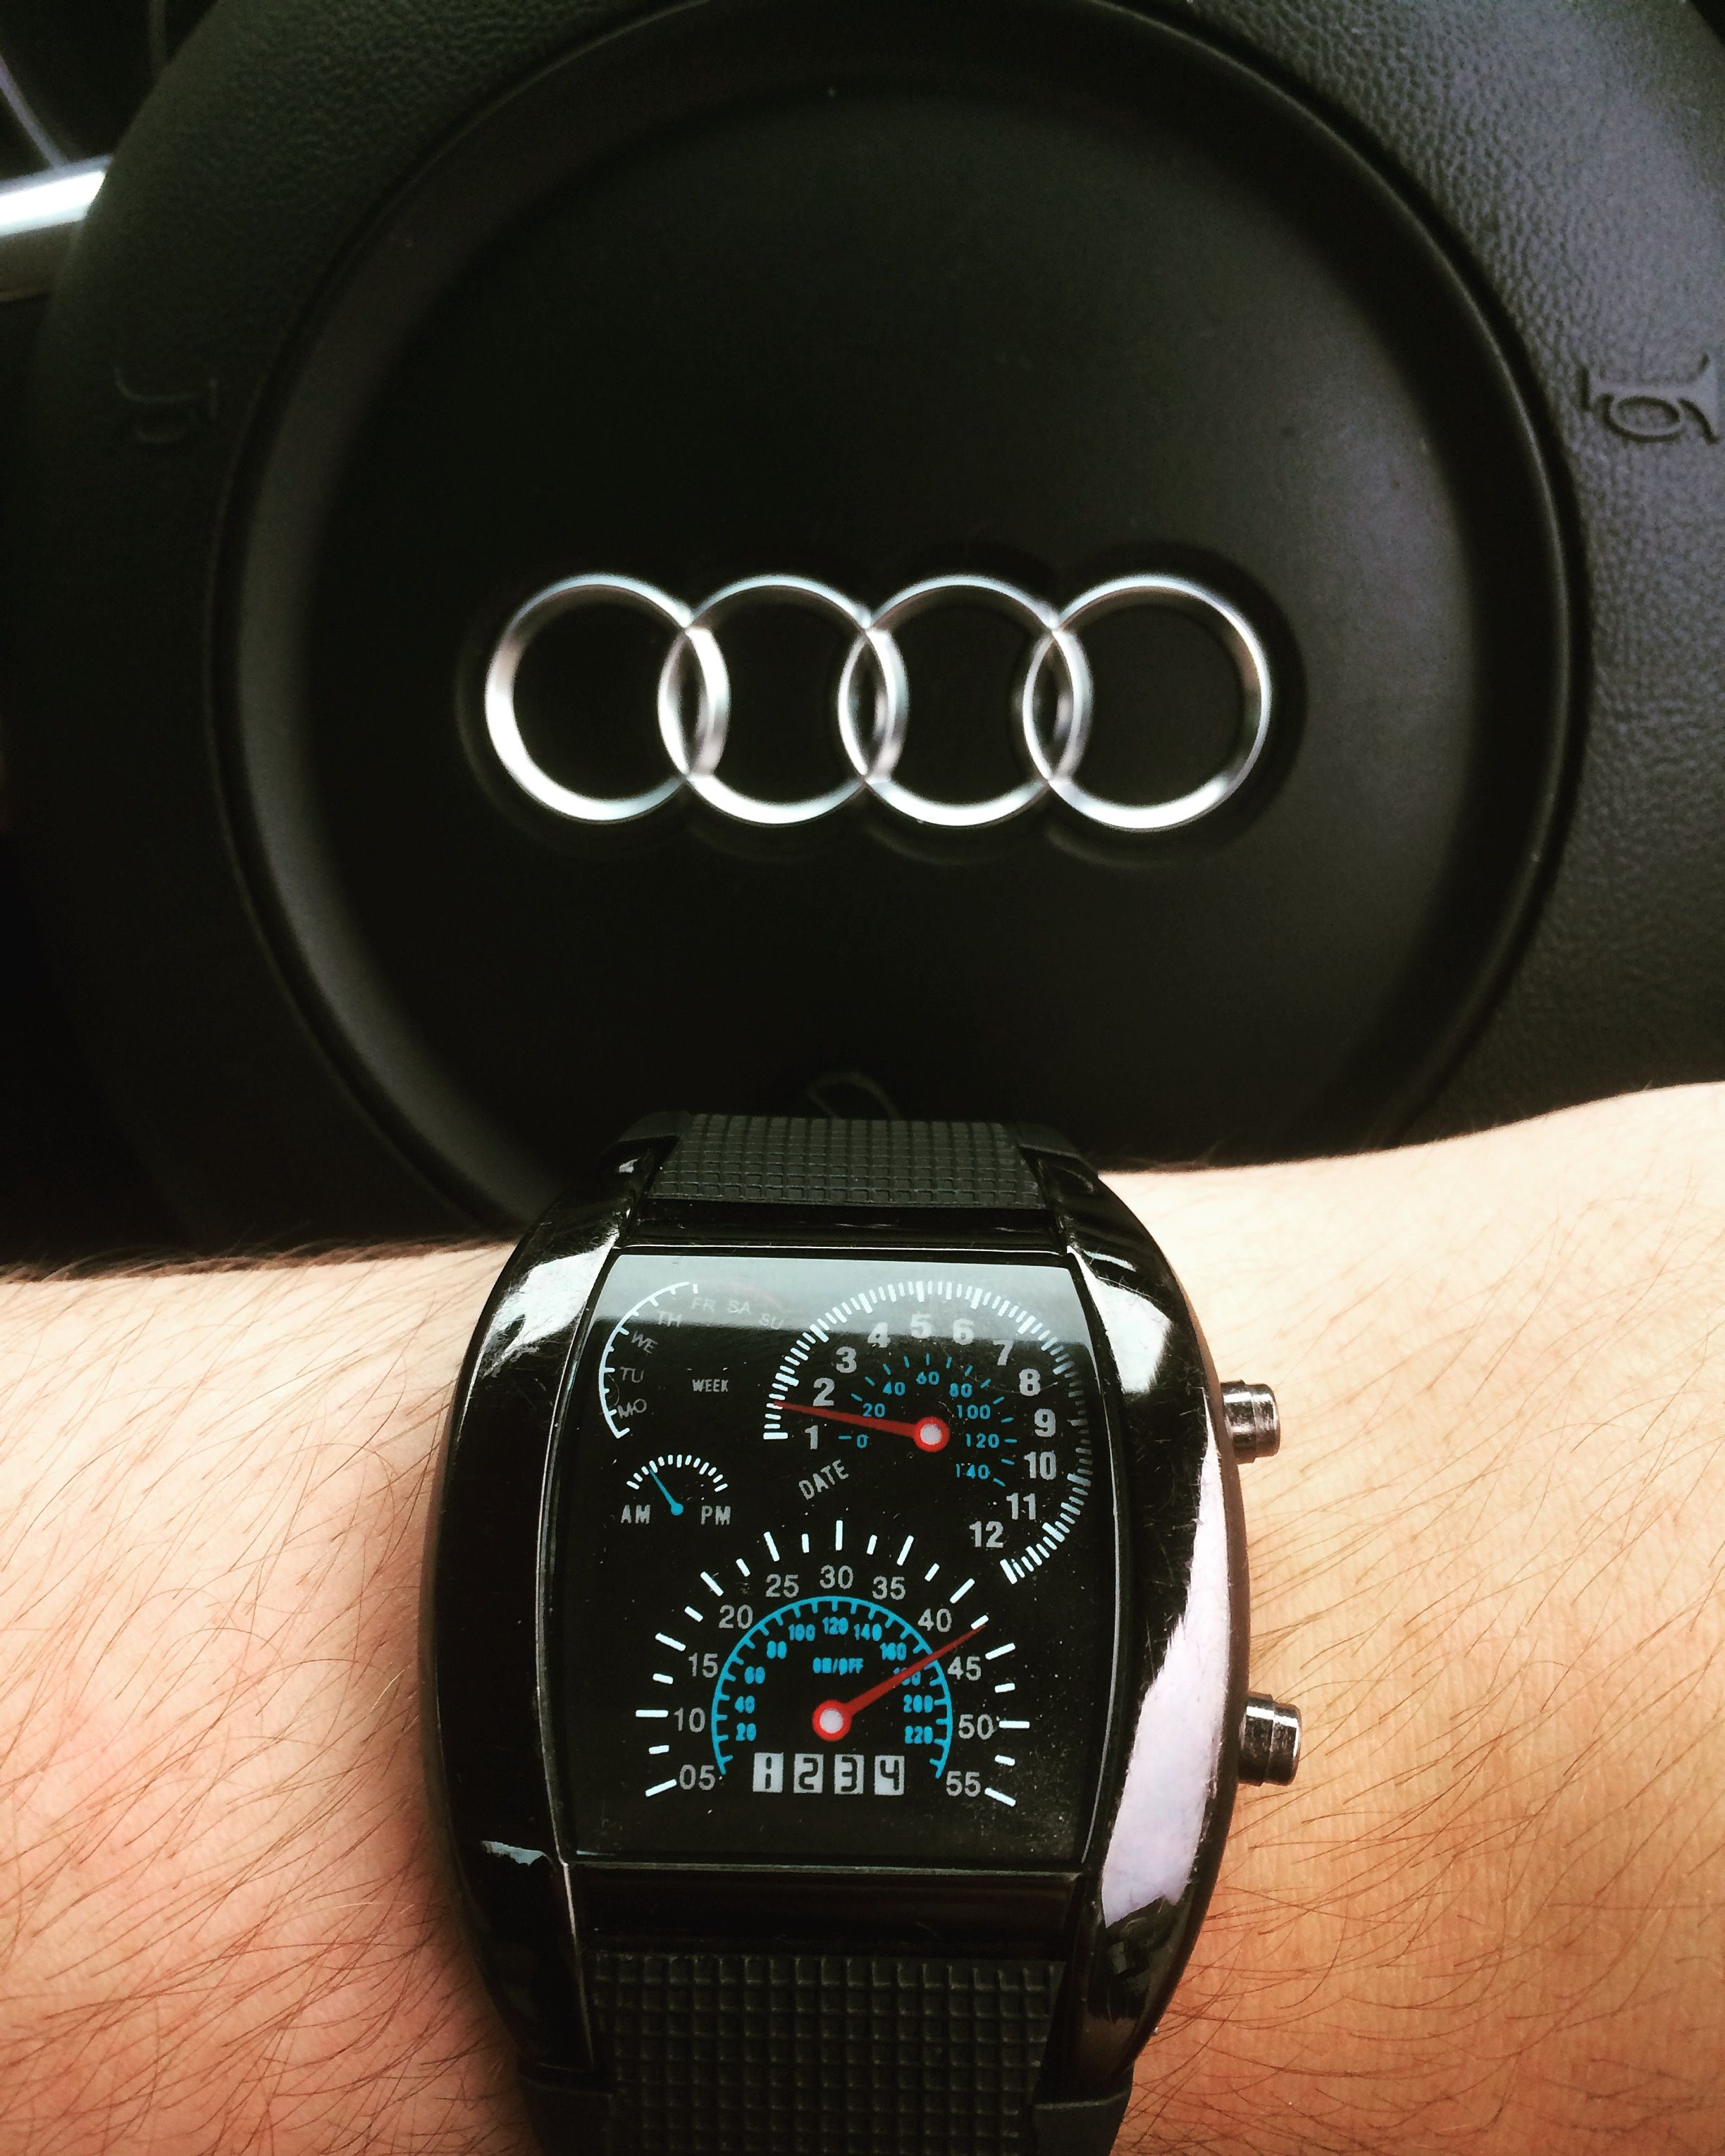 Audi TT With Speedometer Watch Audiwatches Luxury Pinterest - Audi watch